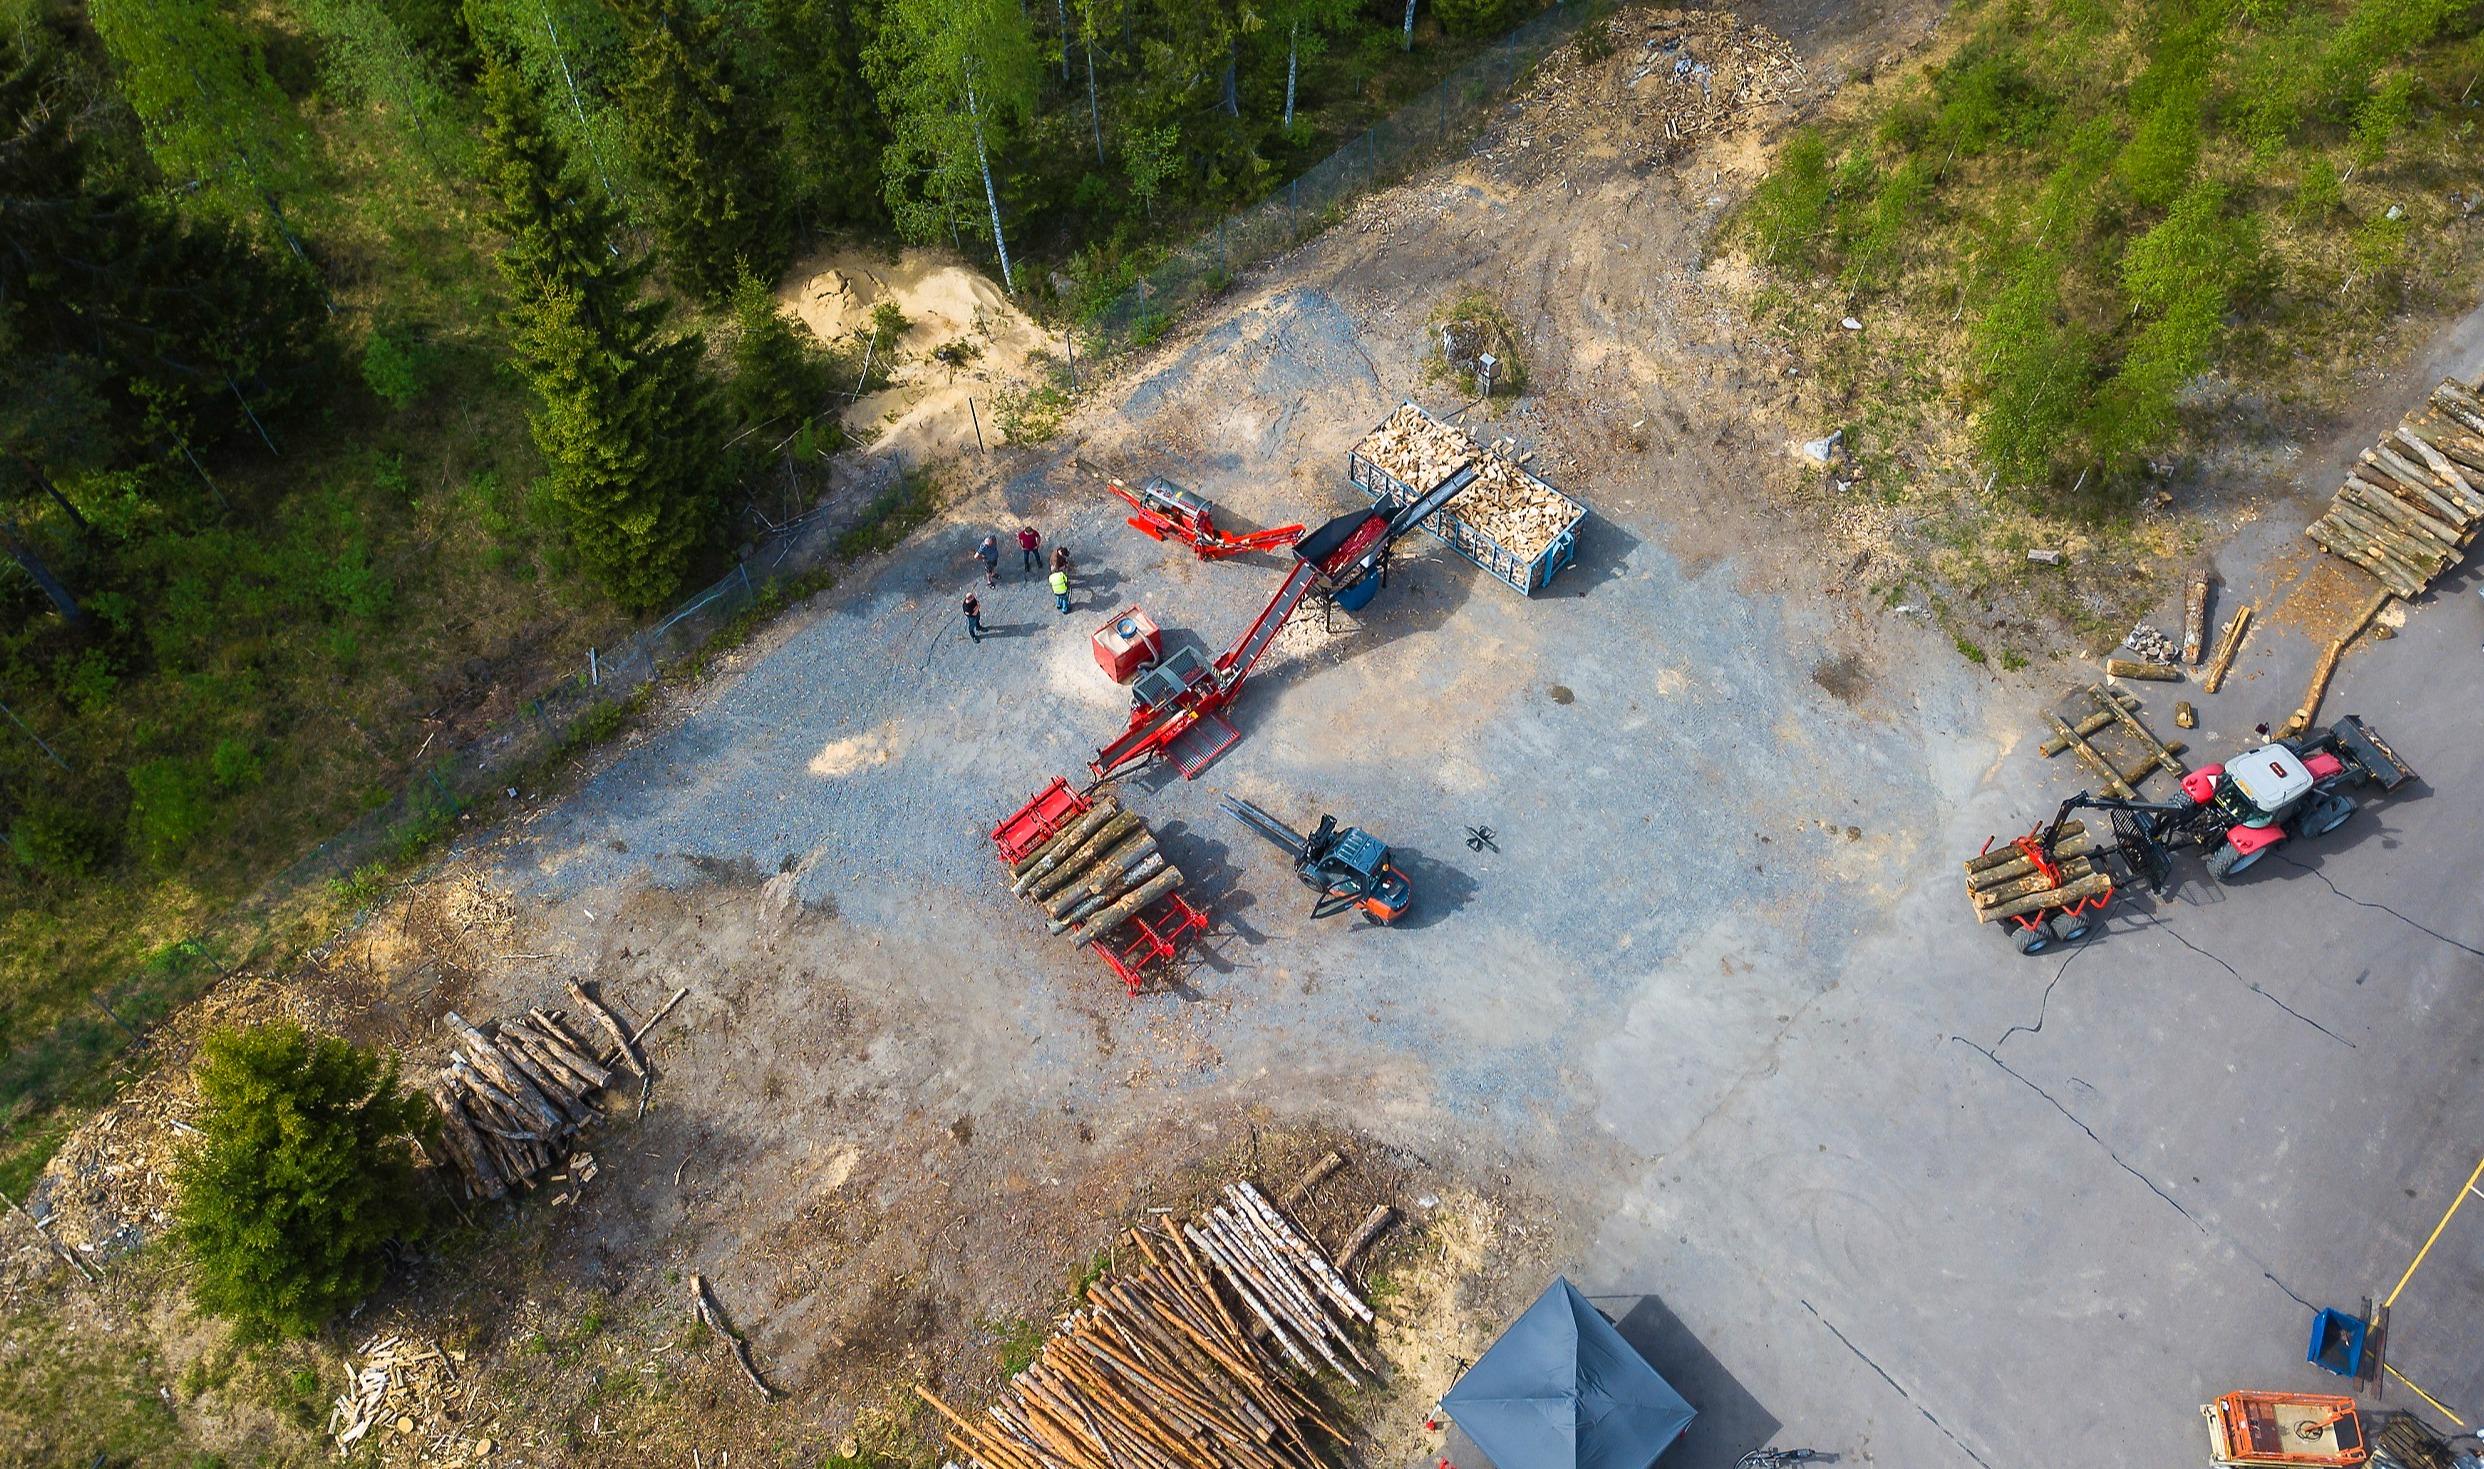 Hakki-Pilke_firewood-operations_aerial-view-1